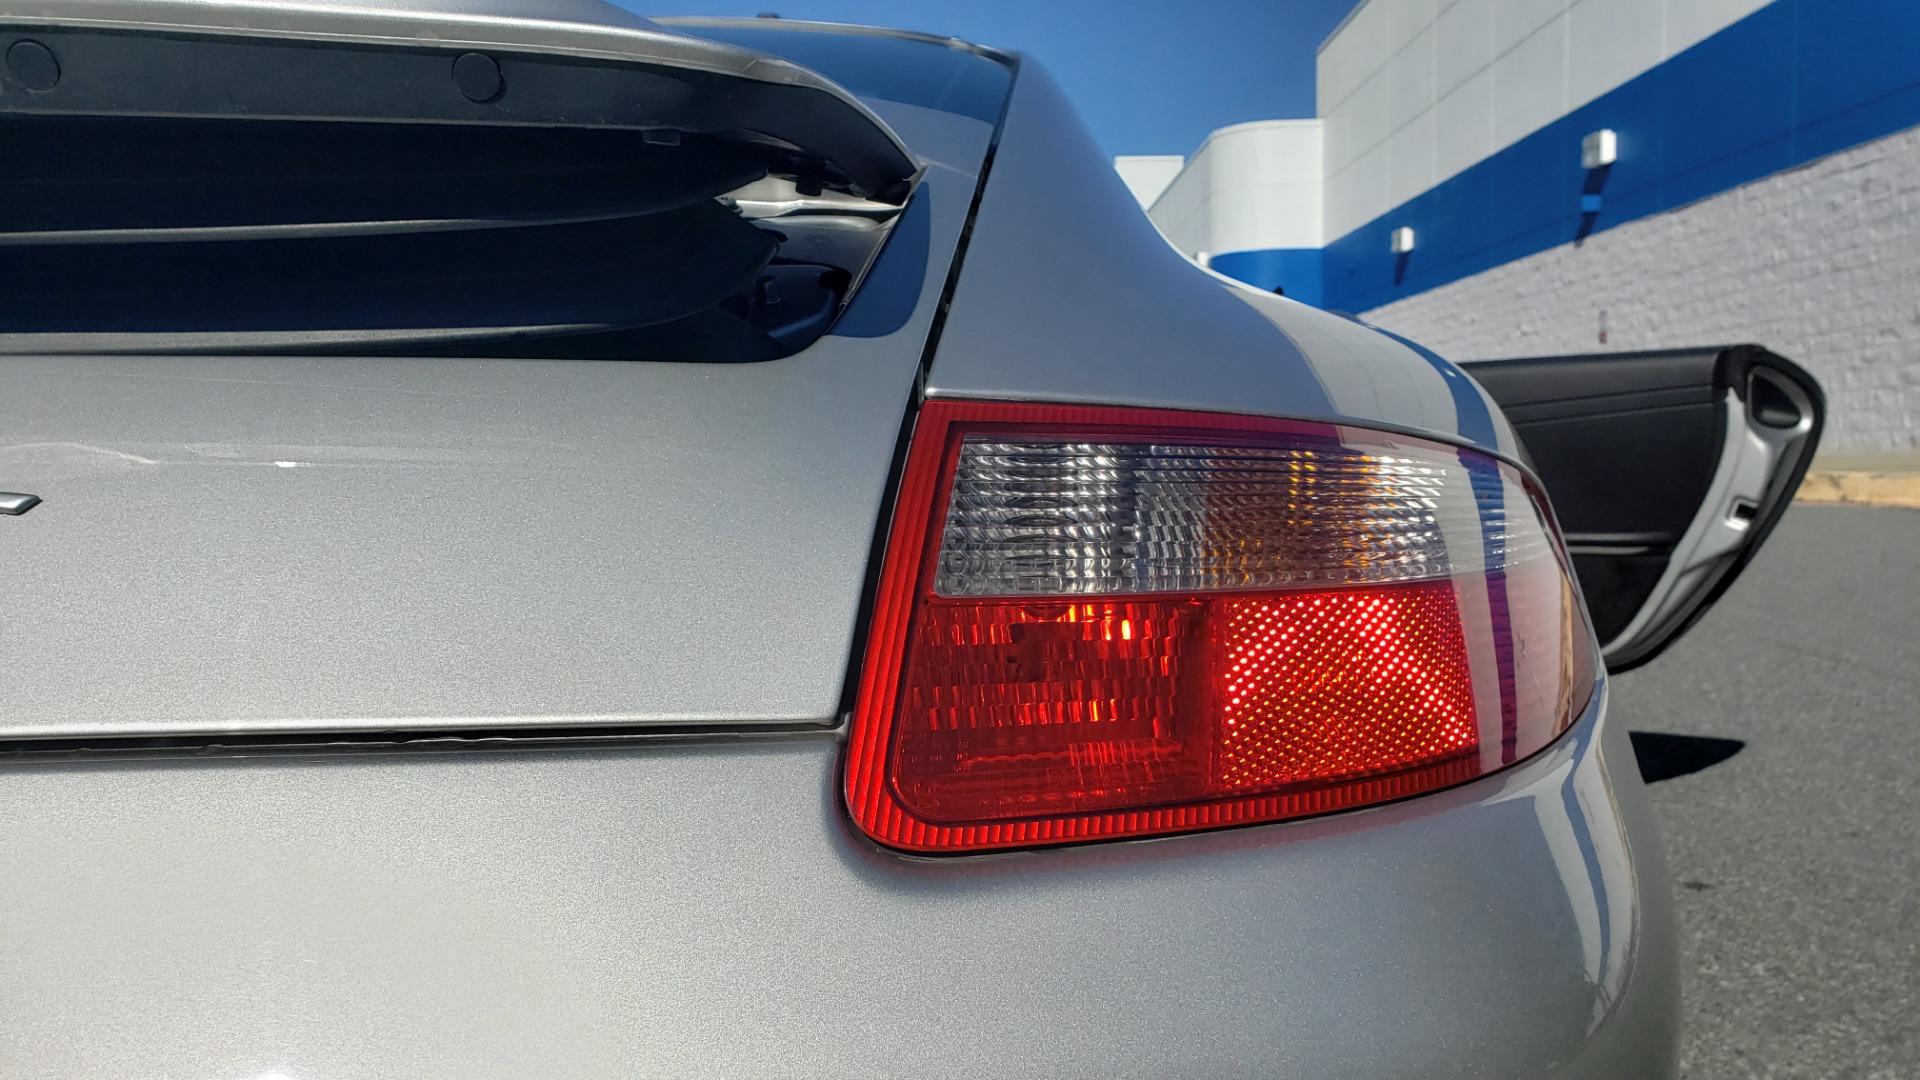 Used 2006 Porsche 911 CARRERA S / 5-SPD AUTO / SPORT CHRONO / NAV / BOSE / SUNROOF for sale Sold at Formula Imports in Charlotte NC 28227 22